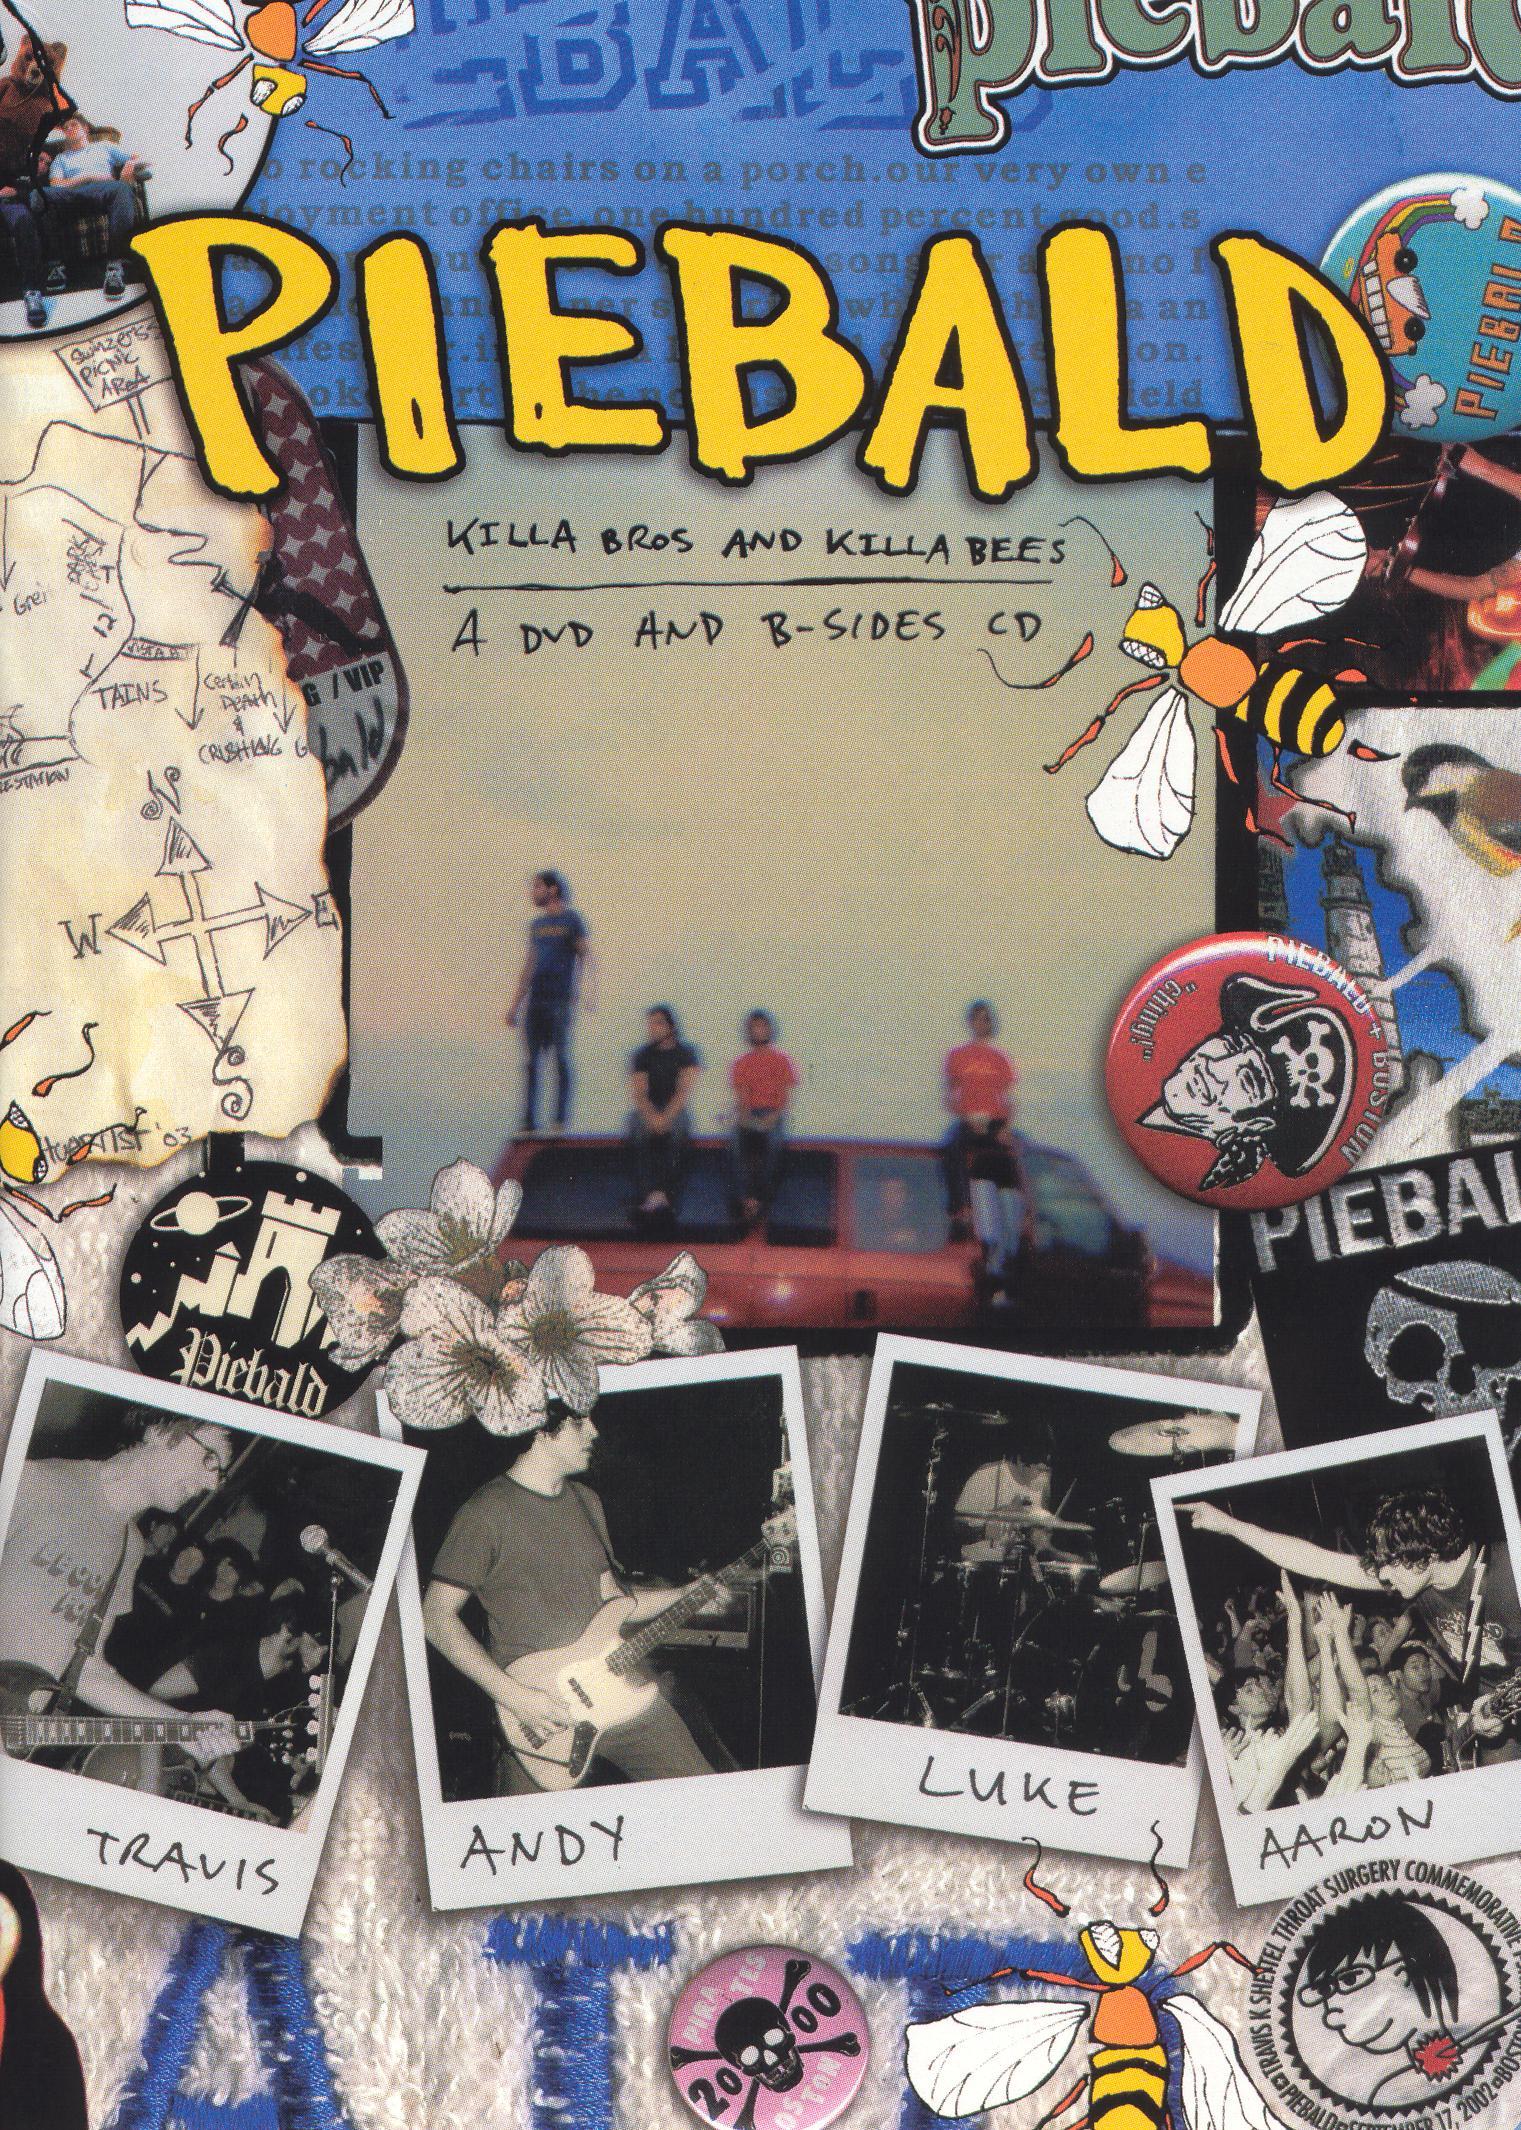 Piebald: Killa Bros and Killa Bees